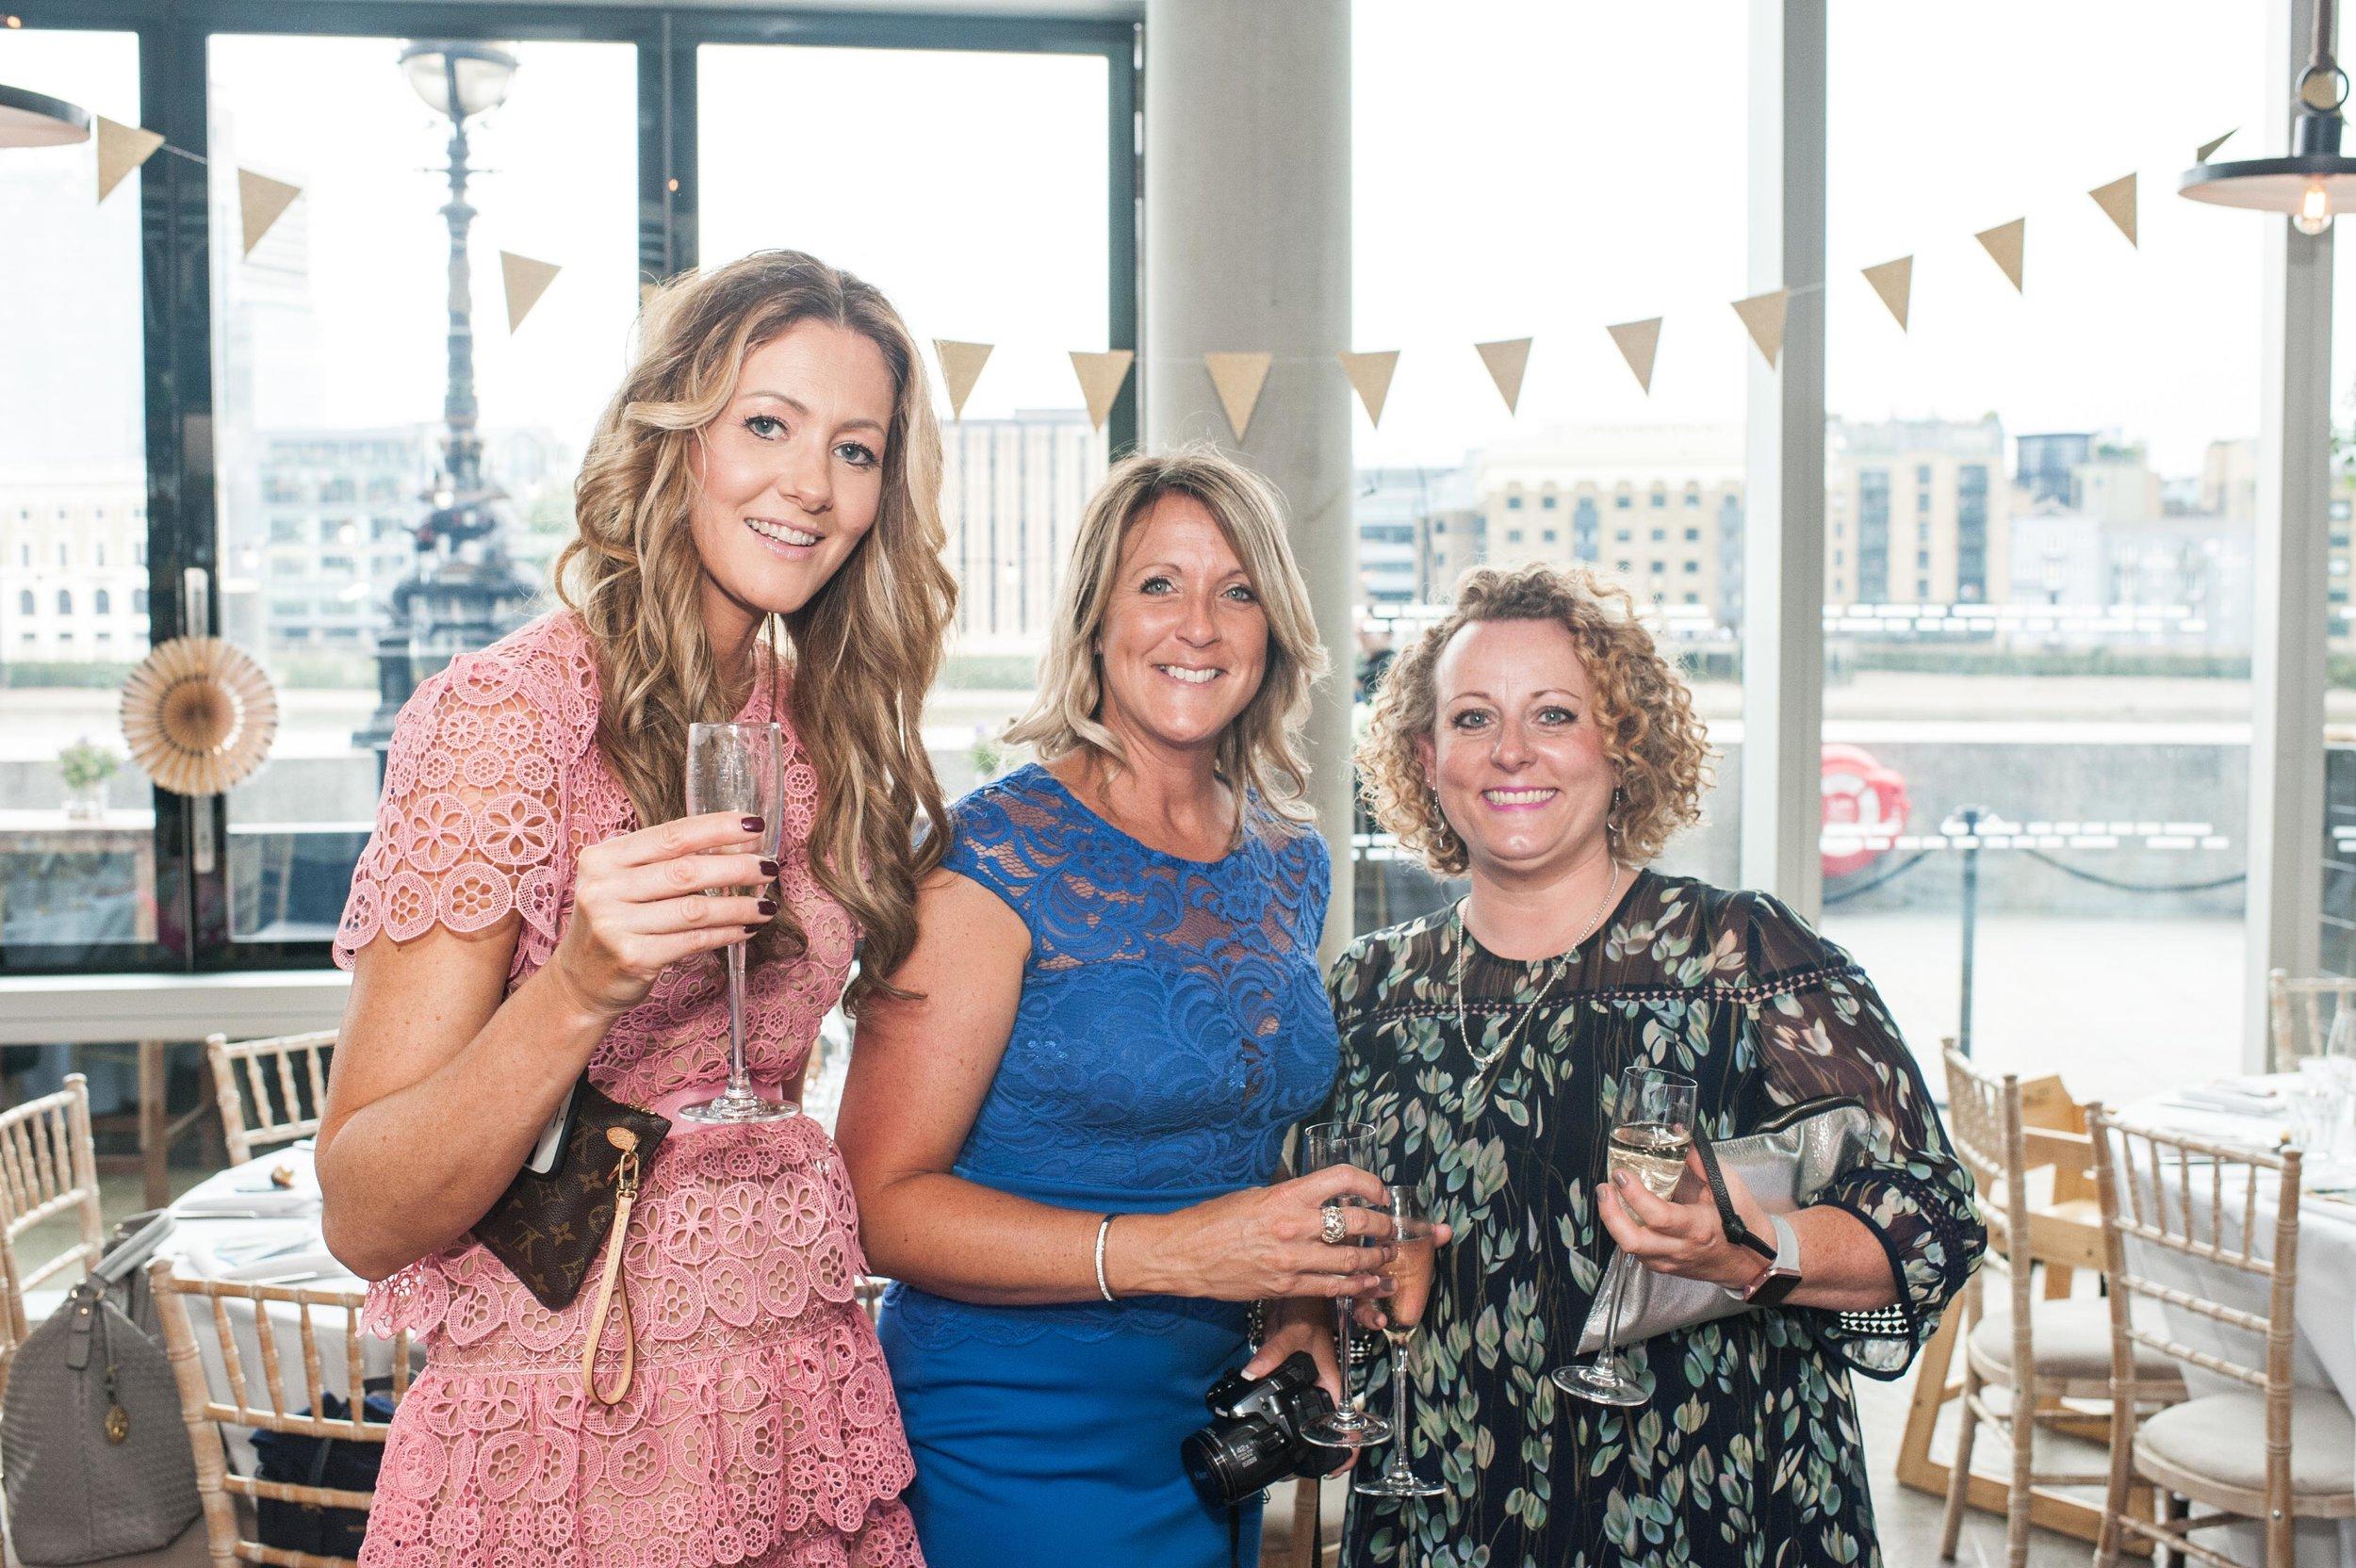 D&M_Marylebone Town Hall Wedding (210 of 239).jpg